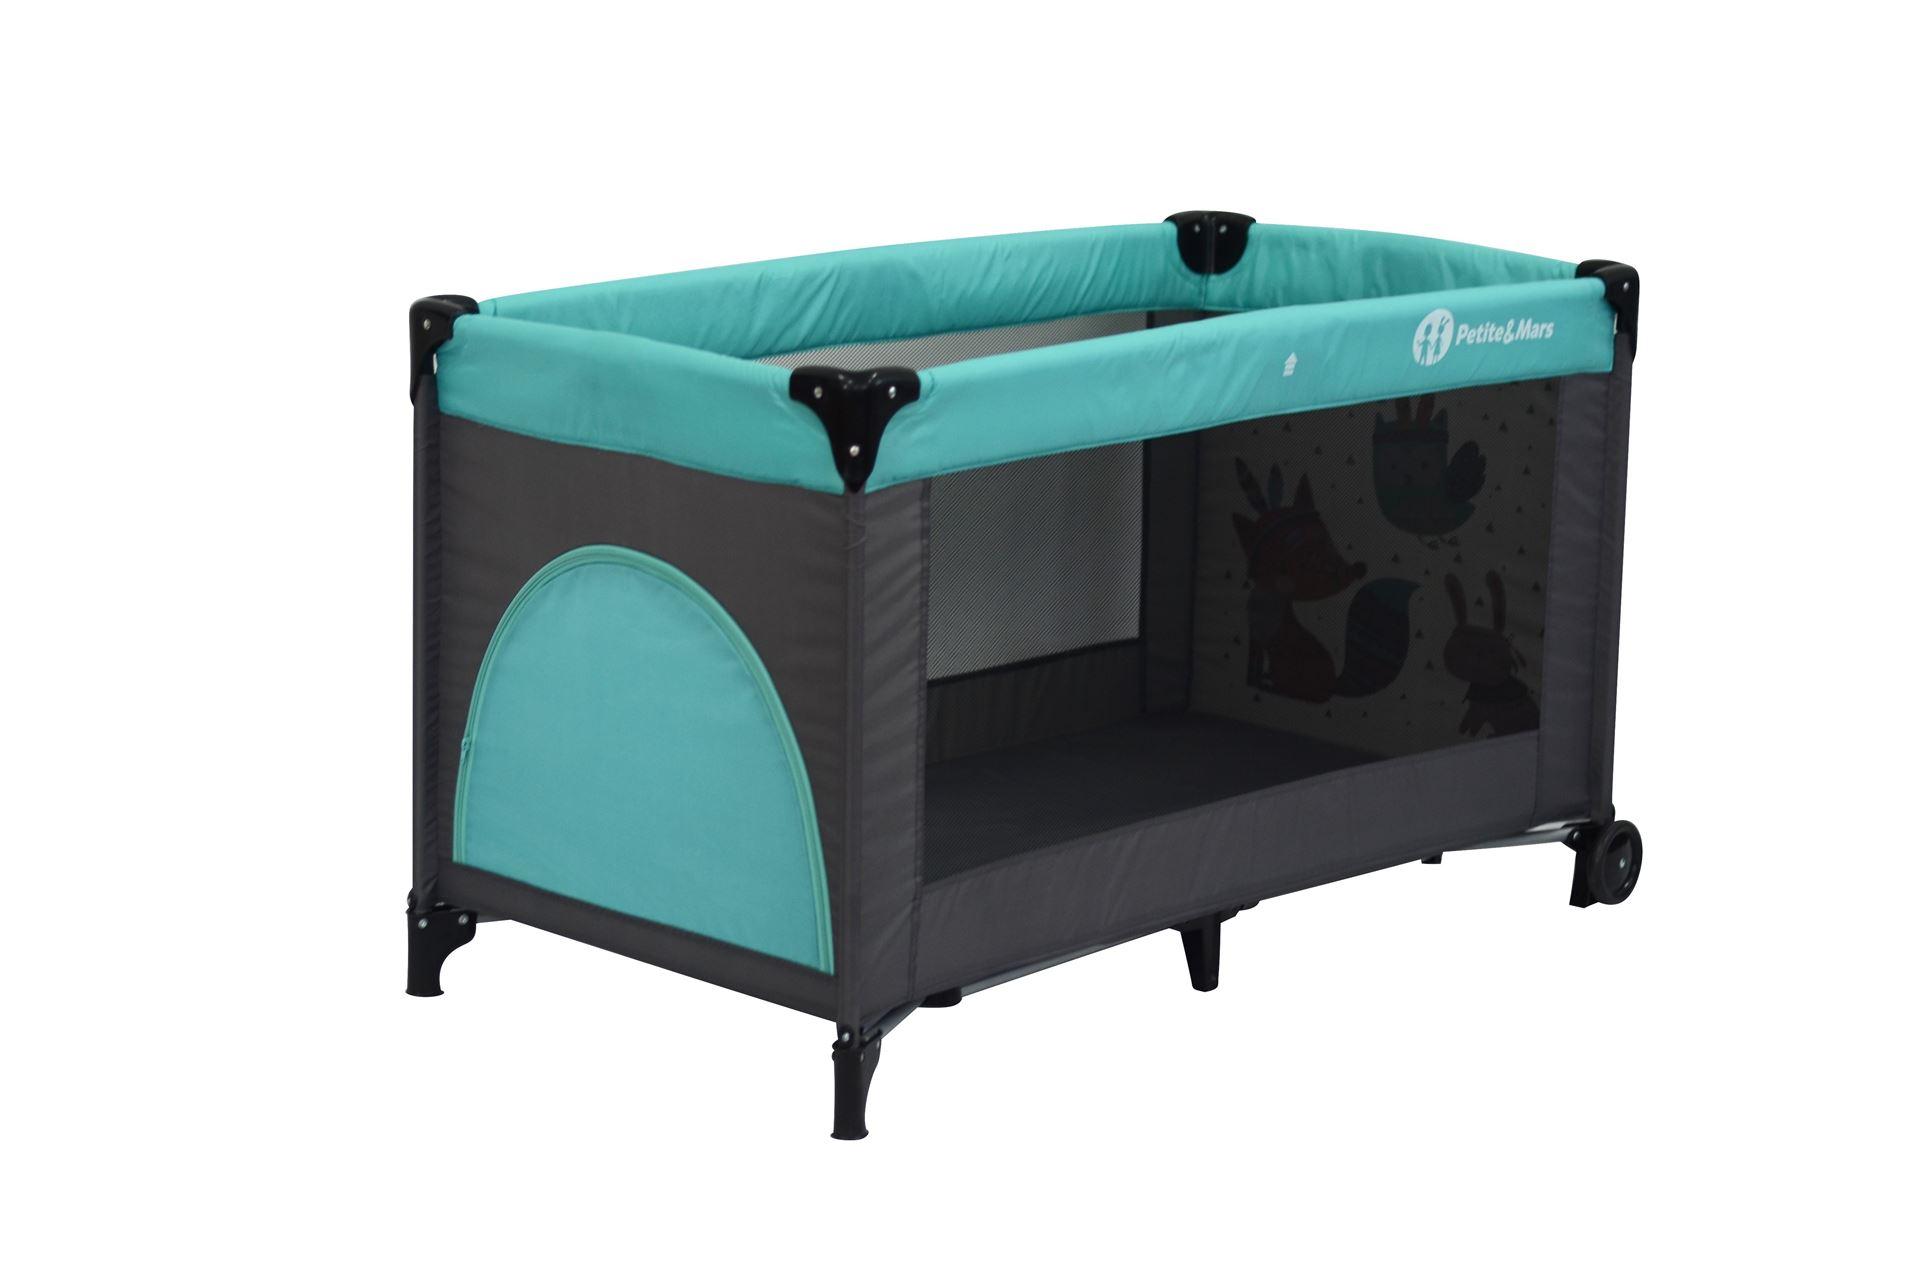 reiseseng madrass affordable bus reiseseng with reiseseng. Black Bedroom Furniture Sets. Home Design Ideas